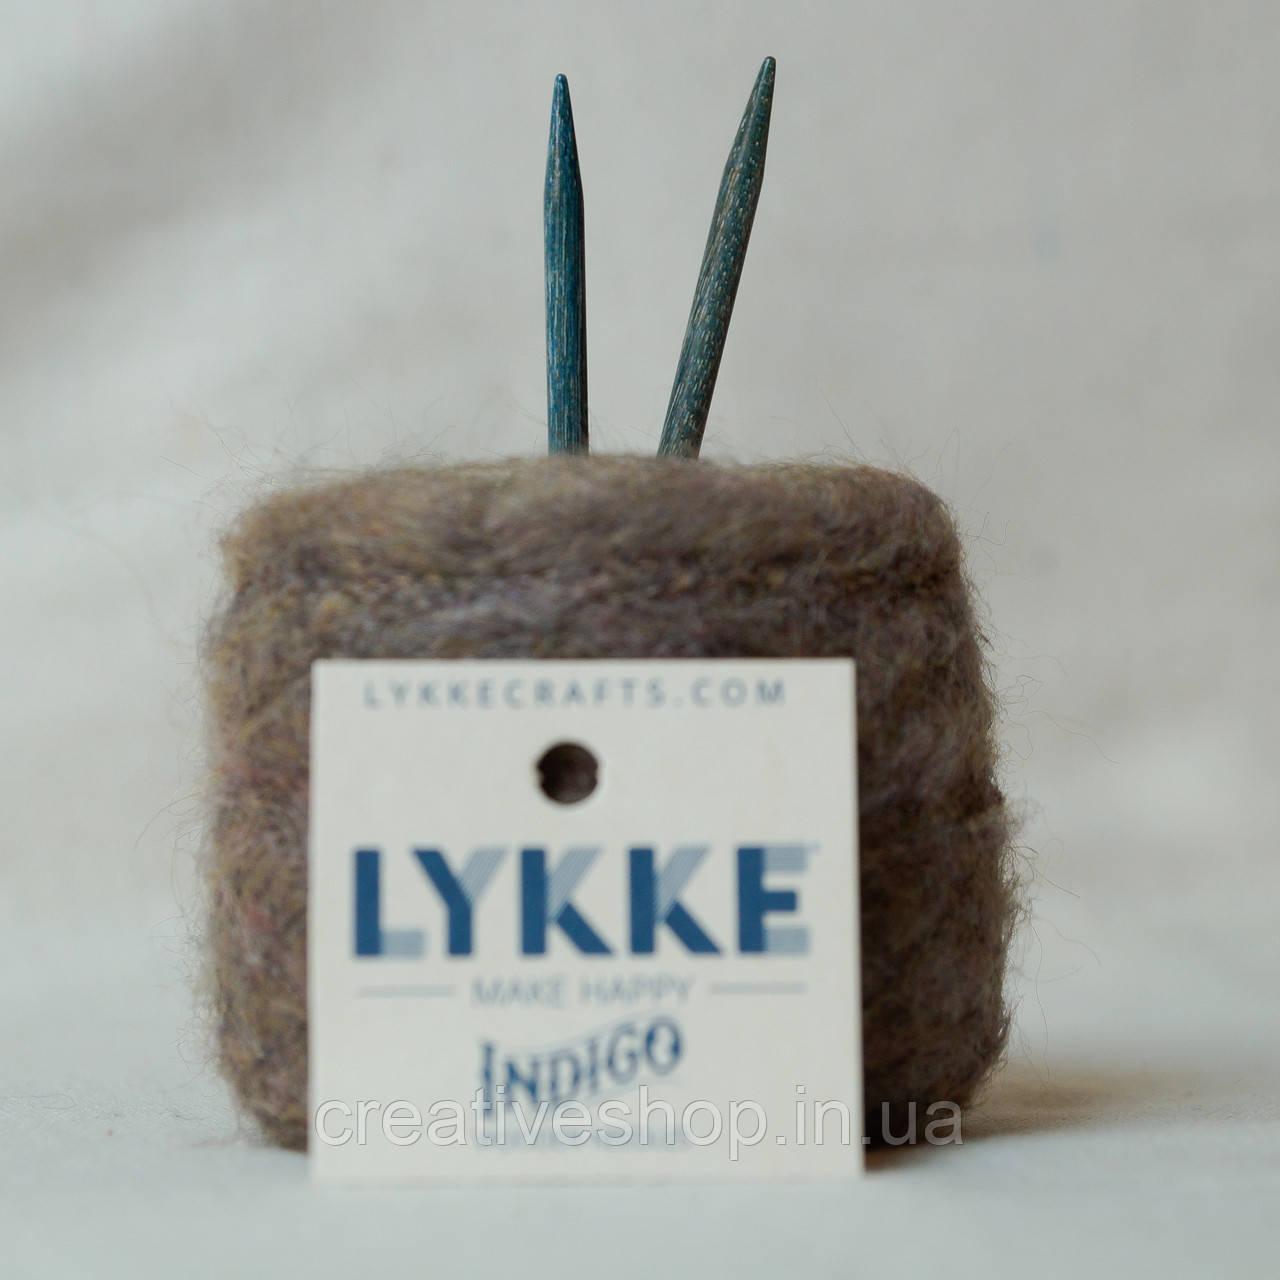 Съемные  стандартные спицы Lykke Indigo 6,5